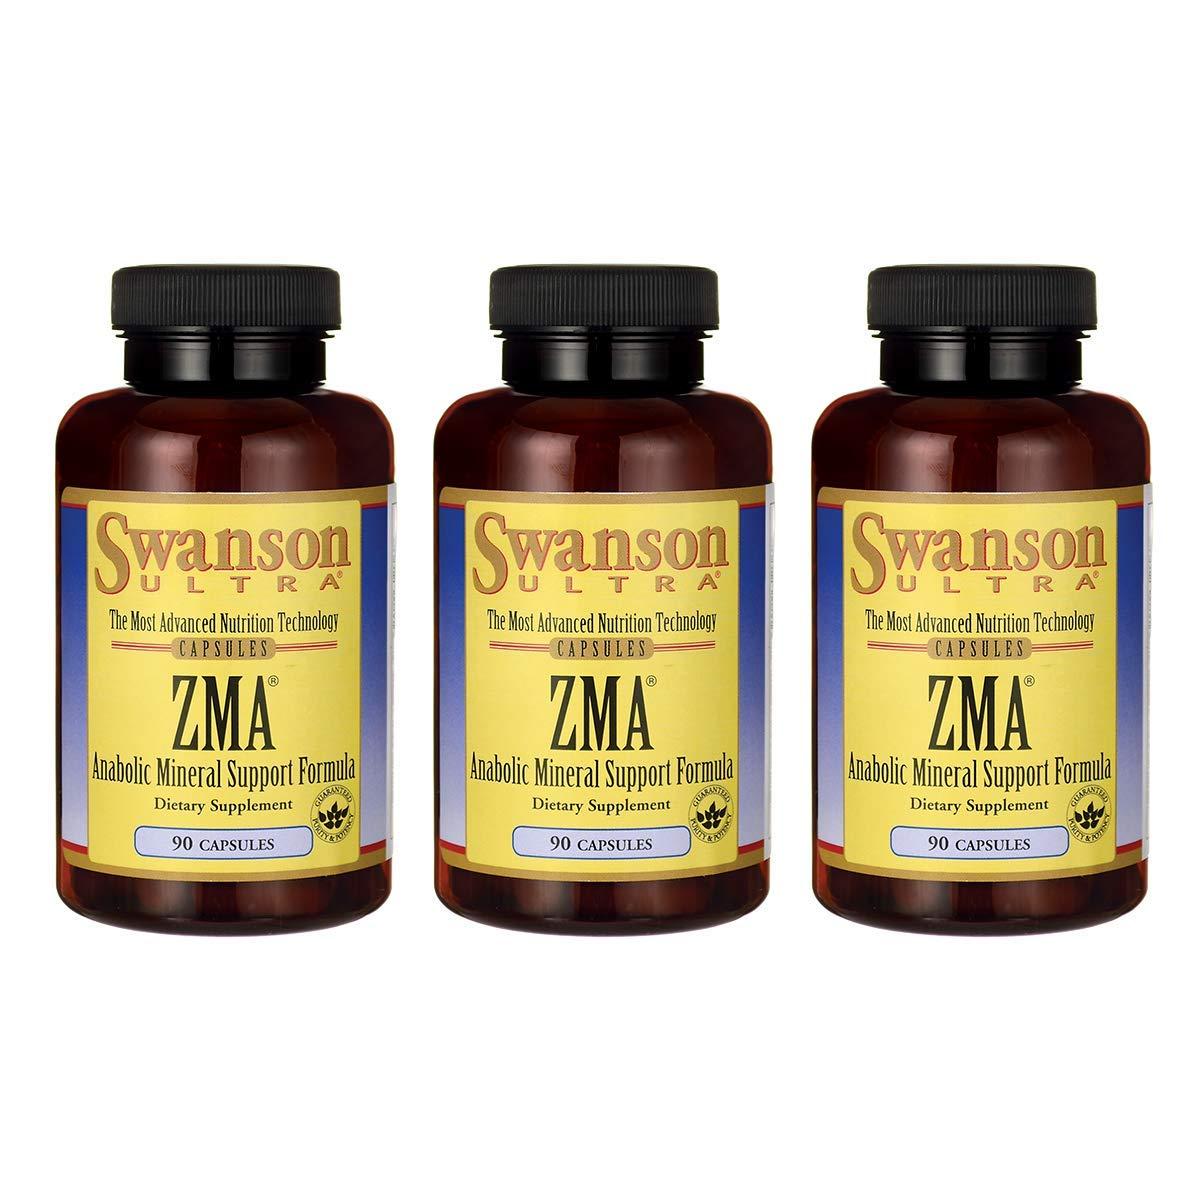 Swanson ZMA 90 Capsules (3 Pack)